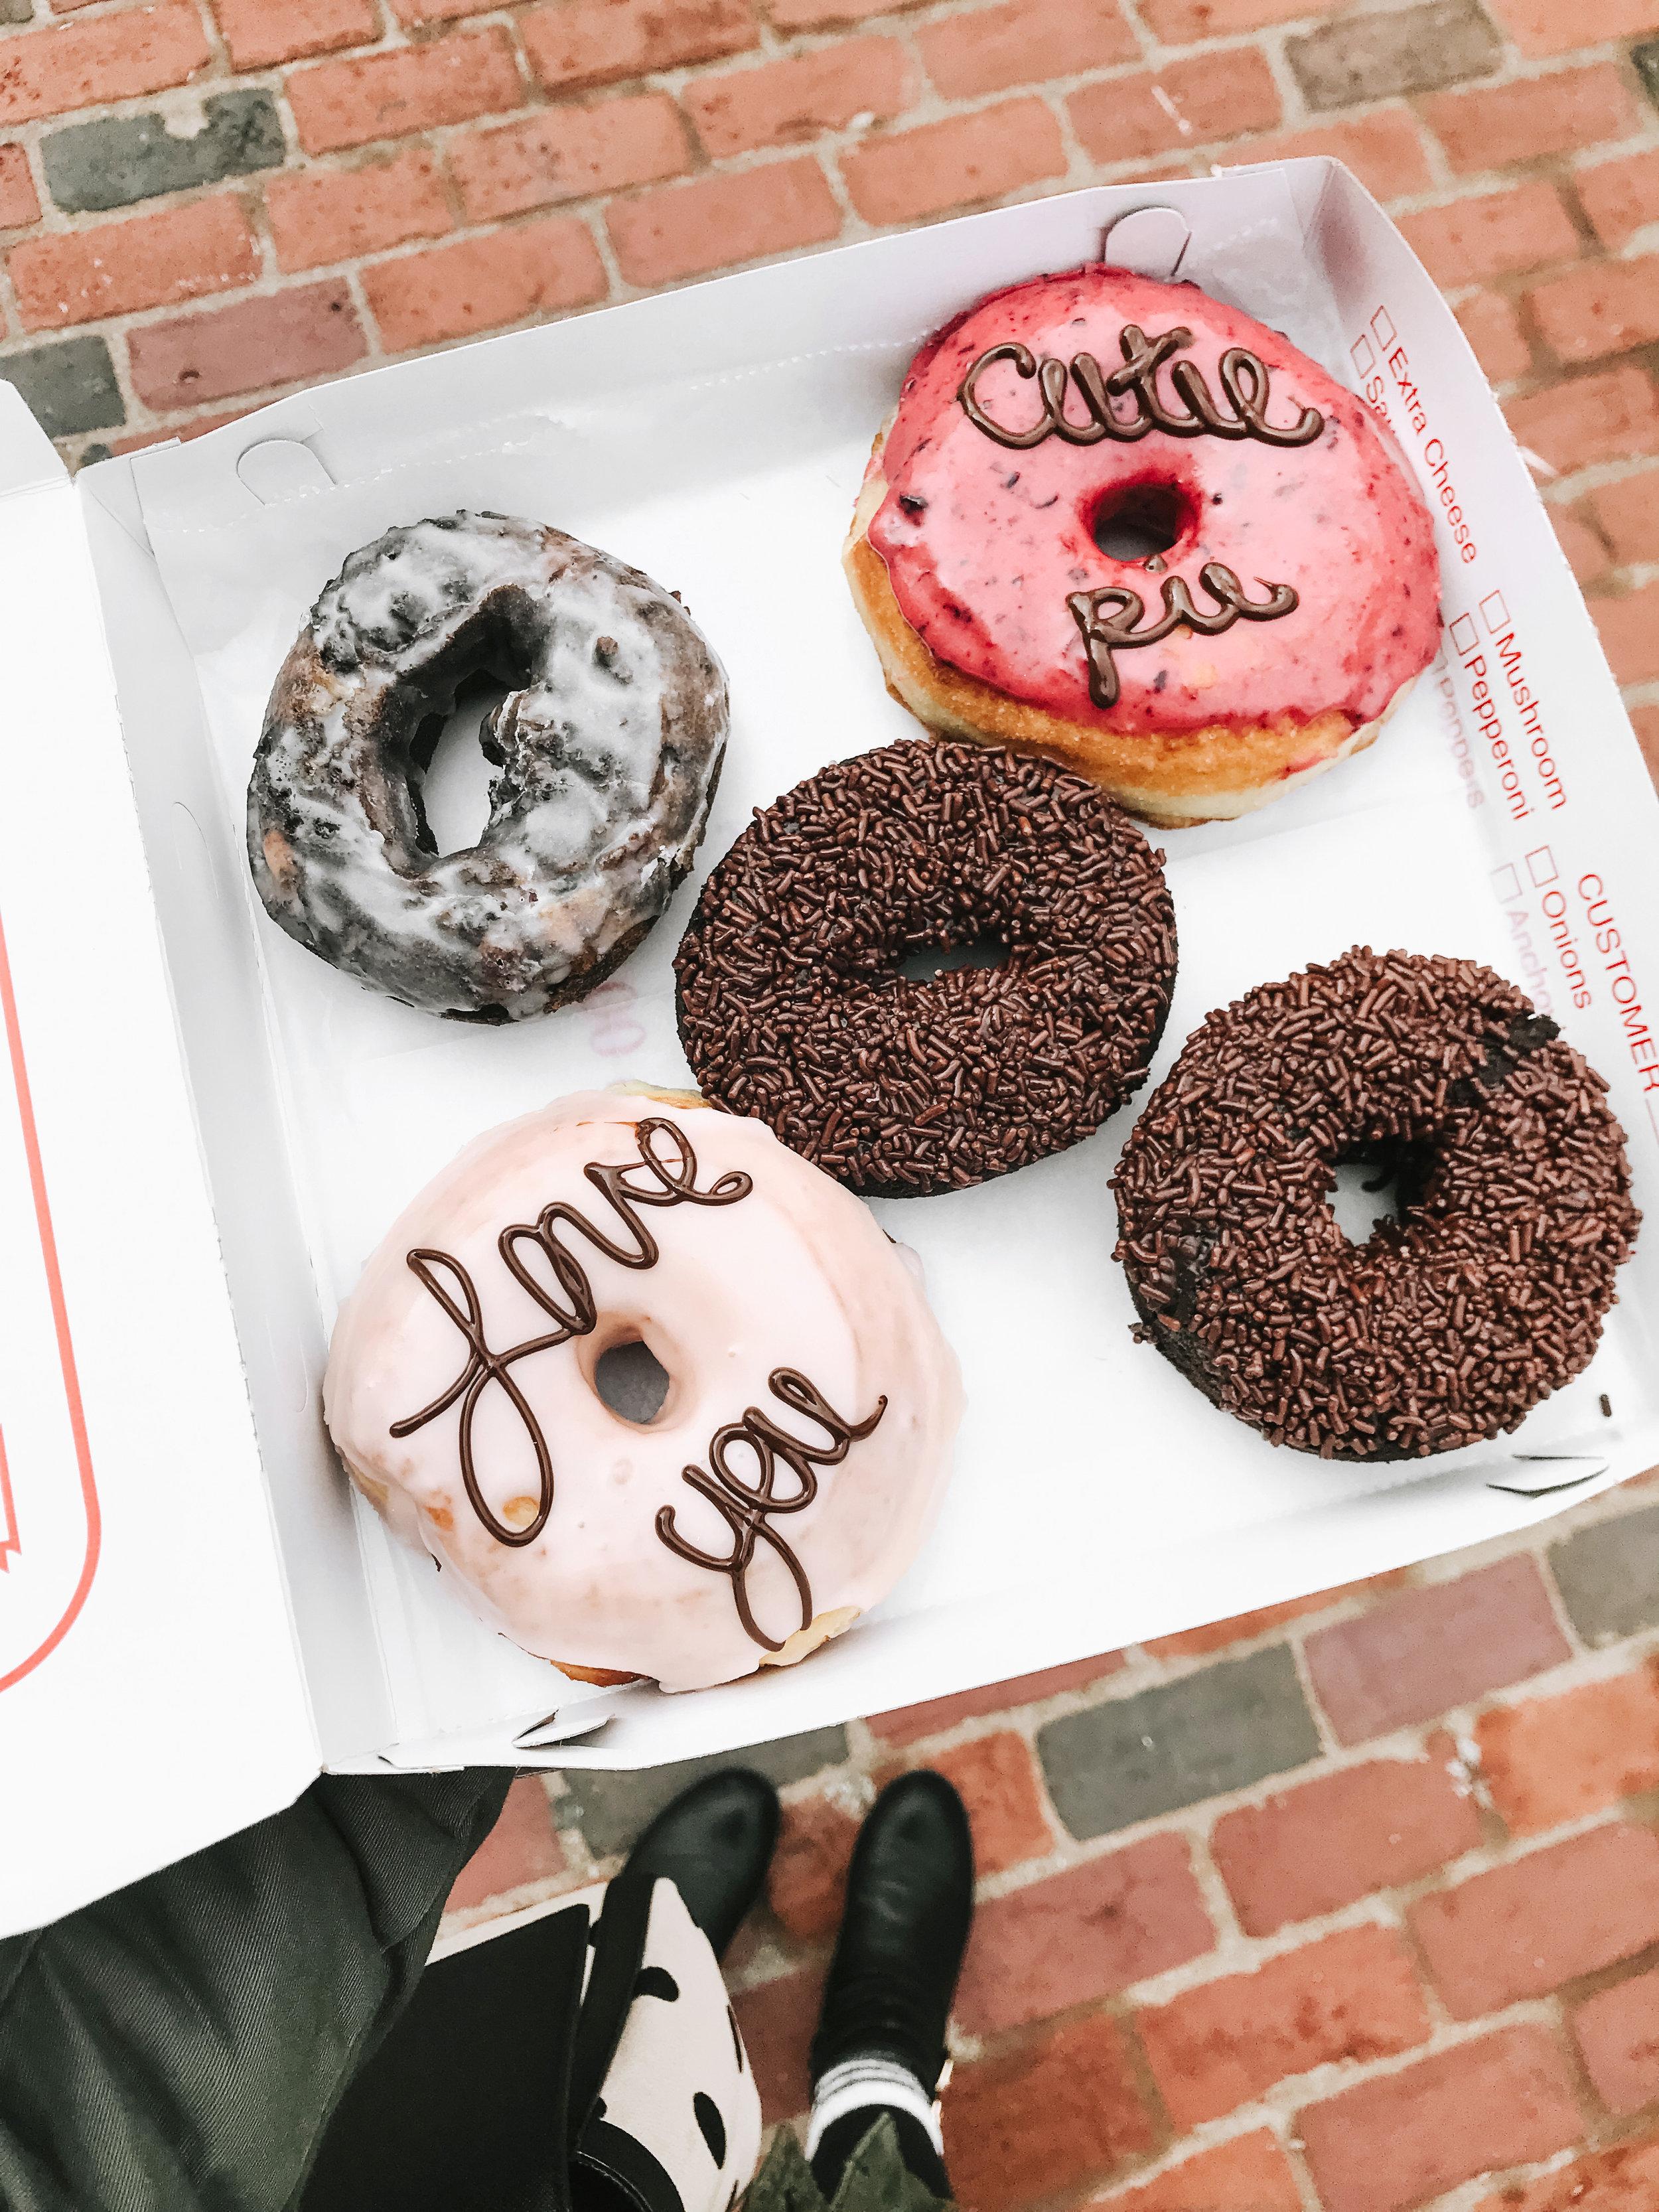 blackbird-doughnuts-tremont-boston-2.JPG